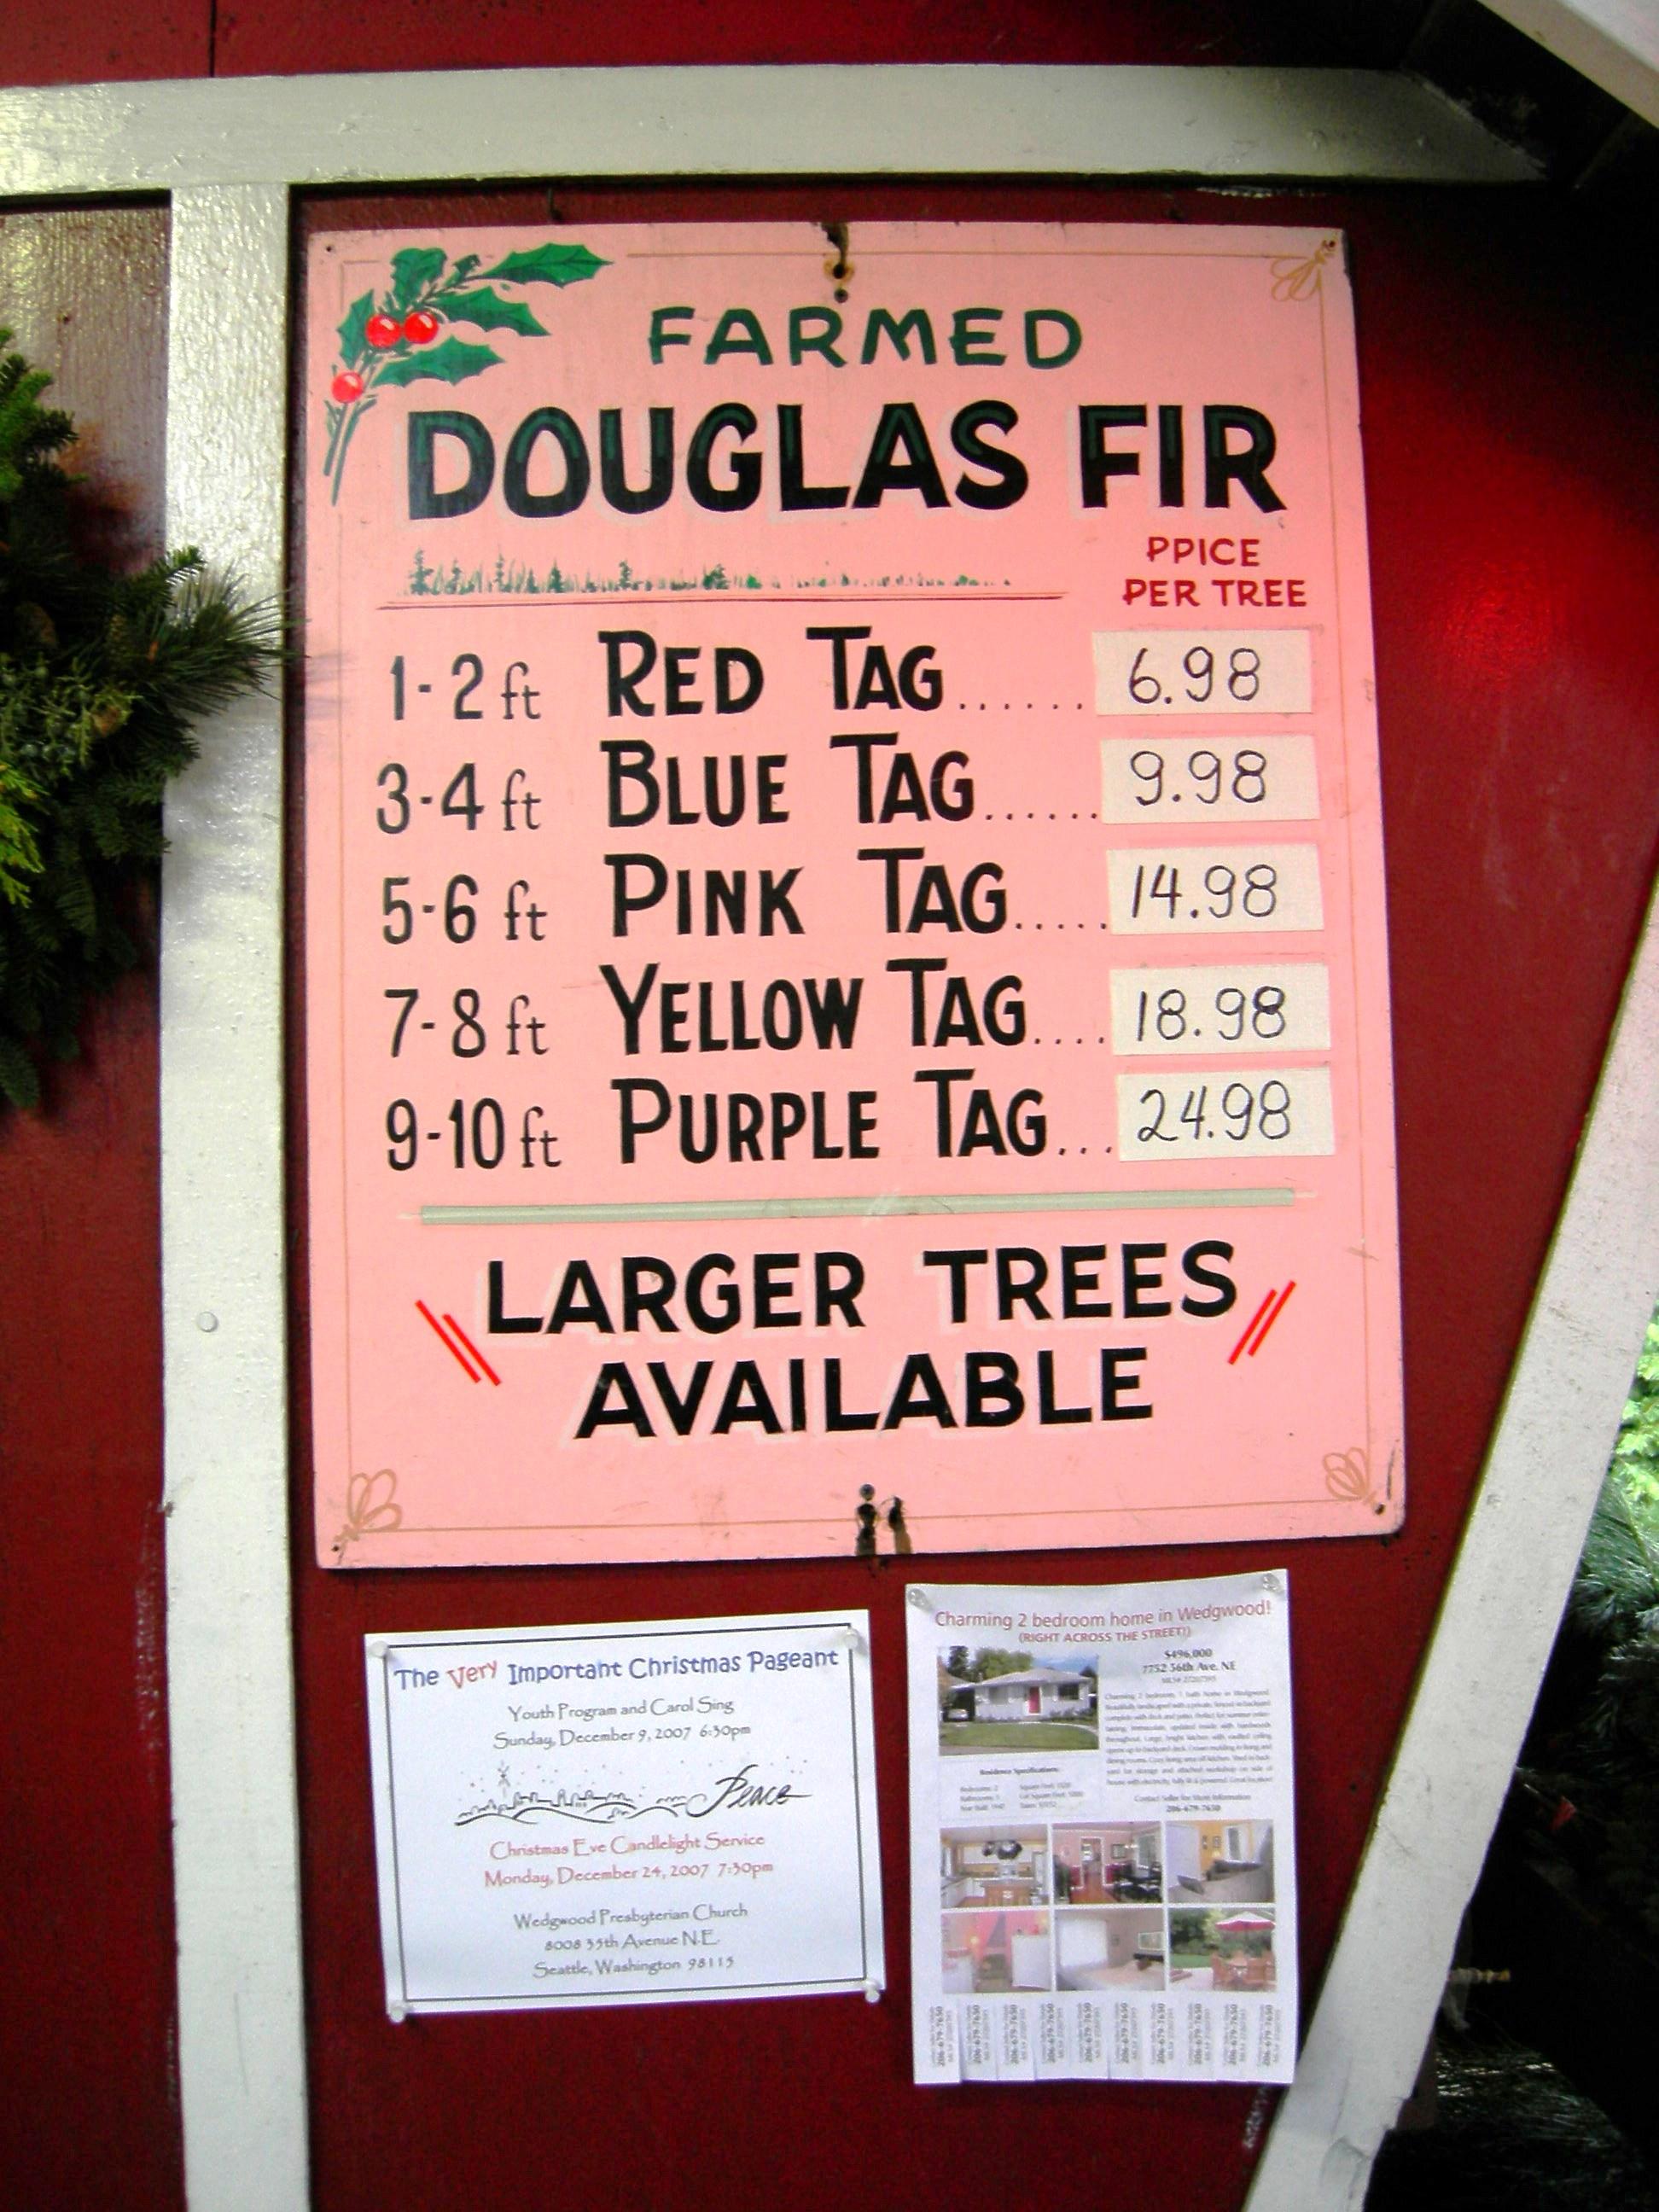 Hunter's Tree Farm Doug Fir